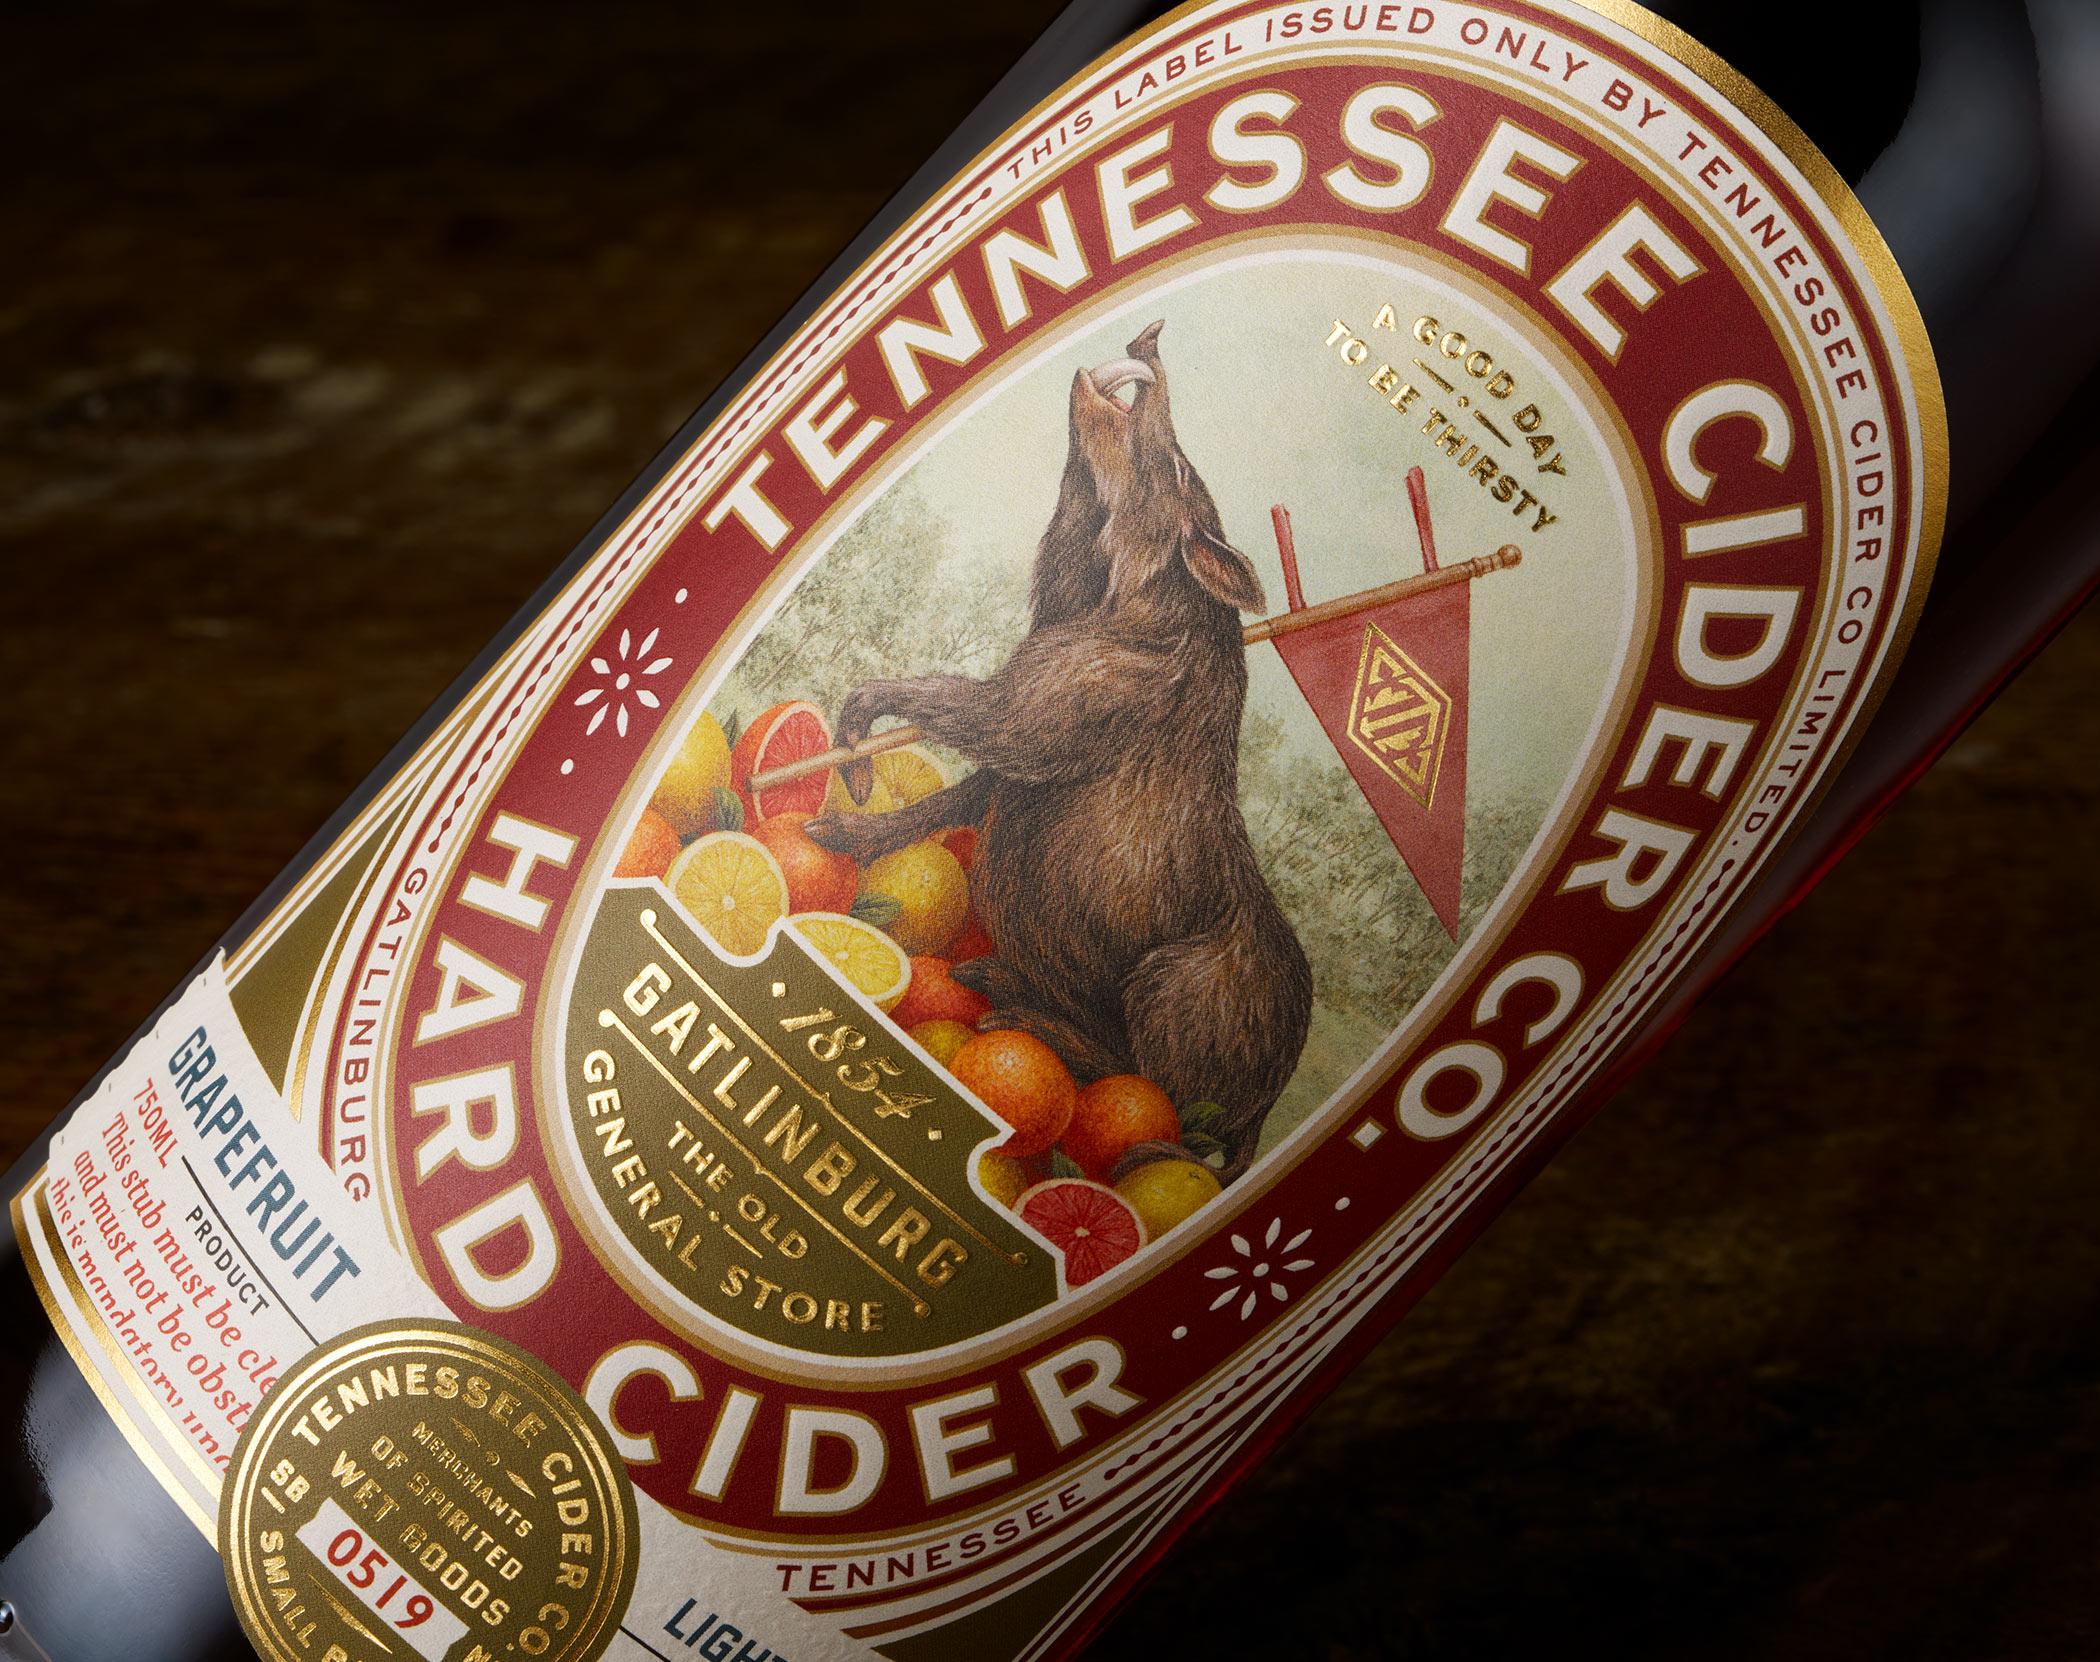 Tennessee Cider - Chad Michael Studio